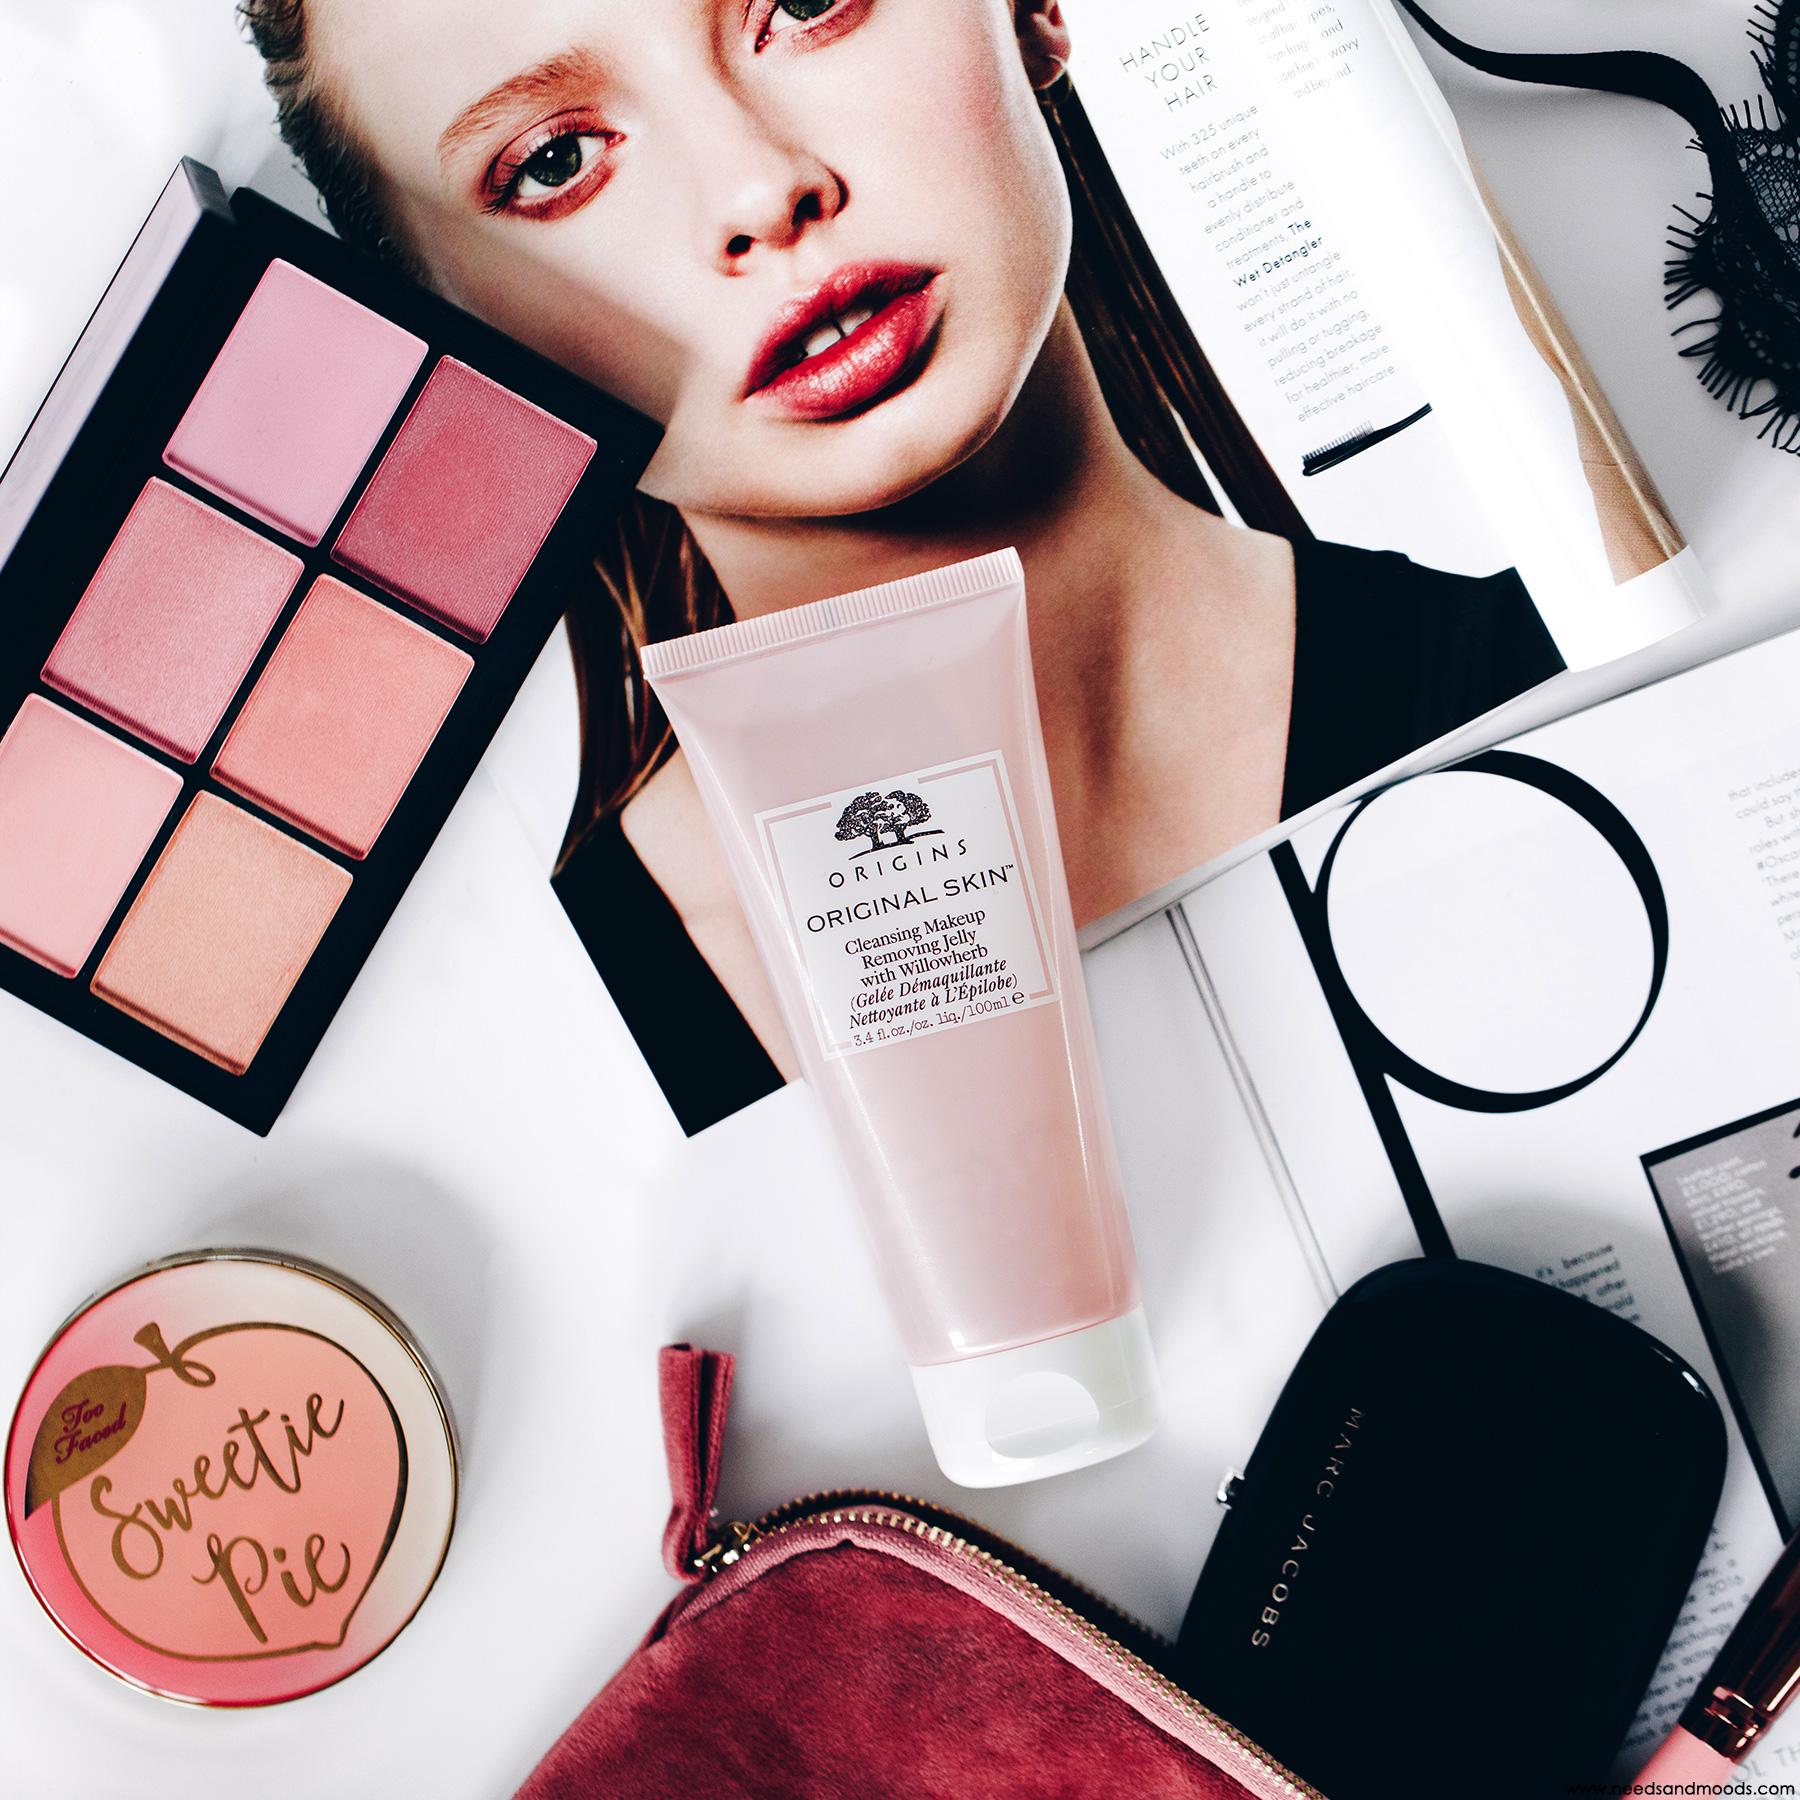 origins original skin cleansing make-up removing jelly